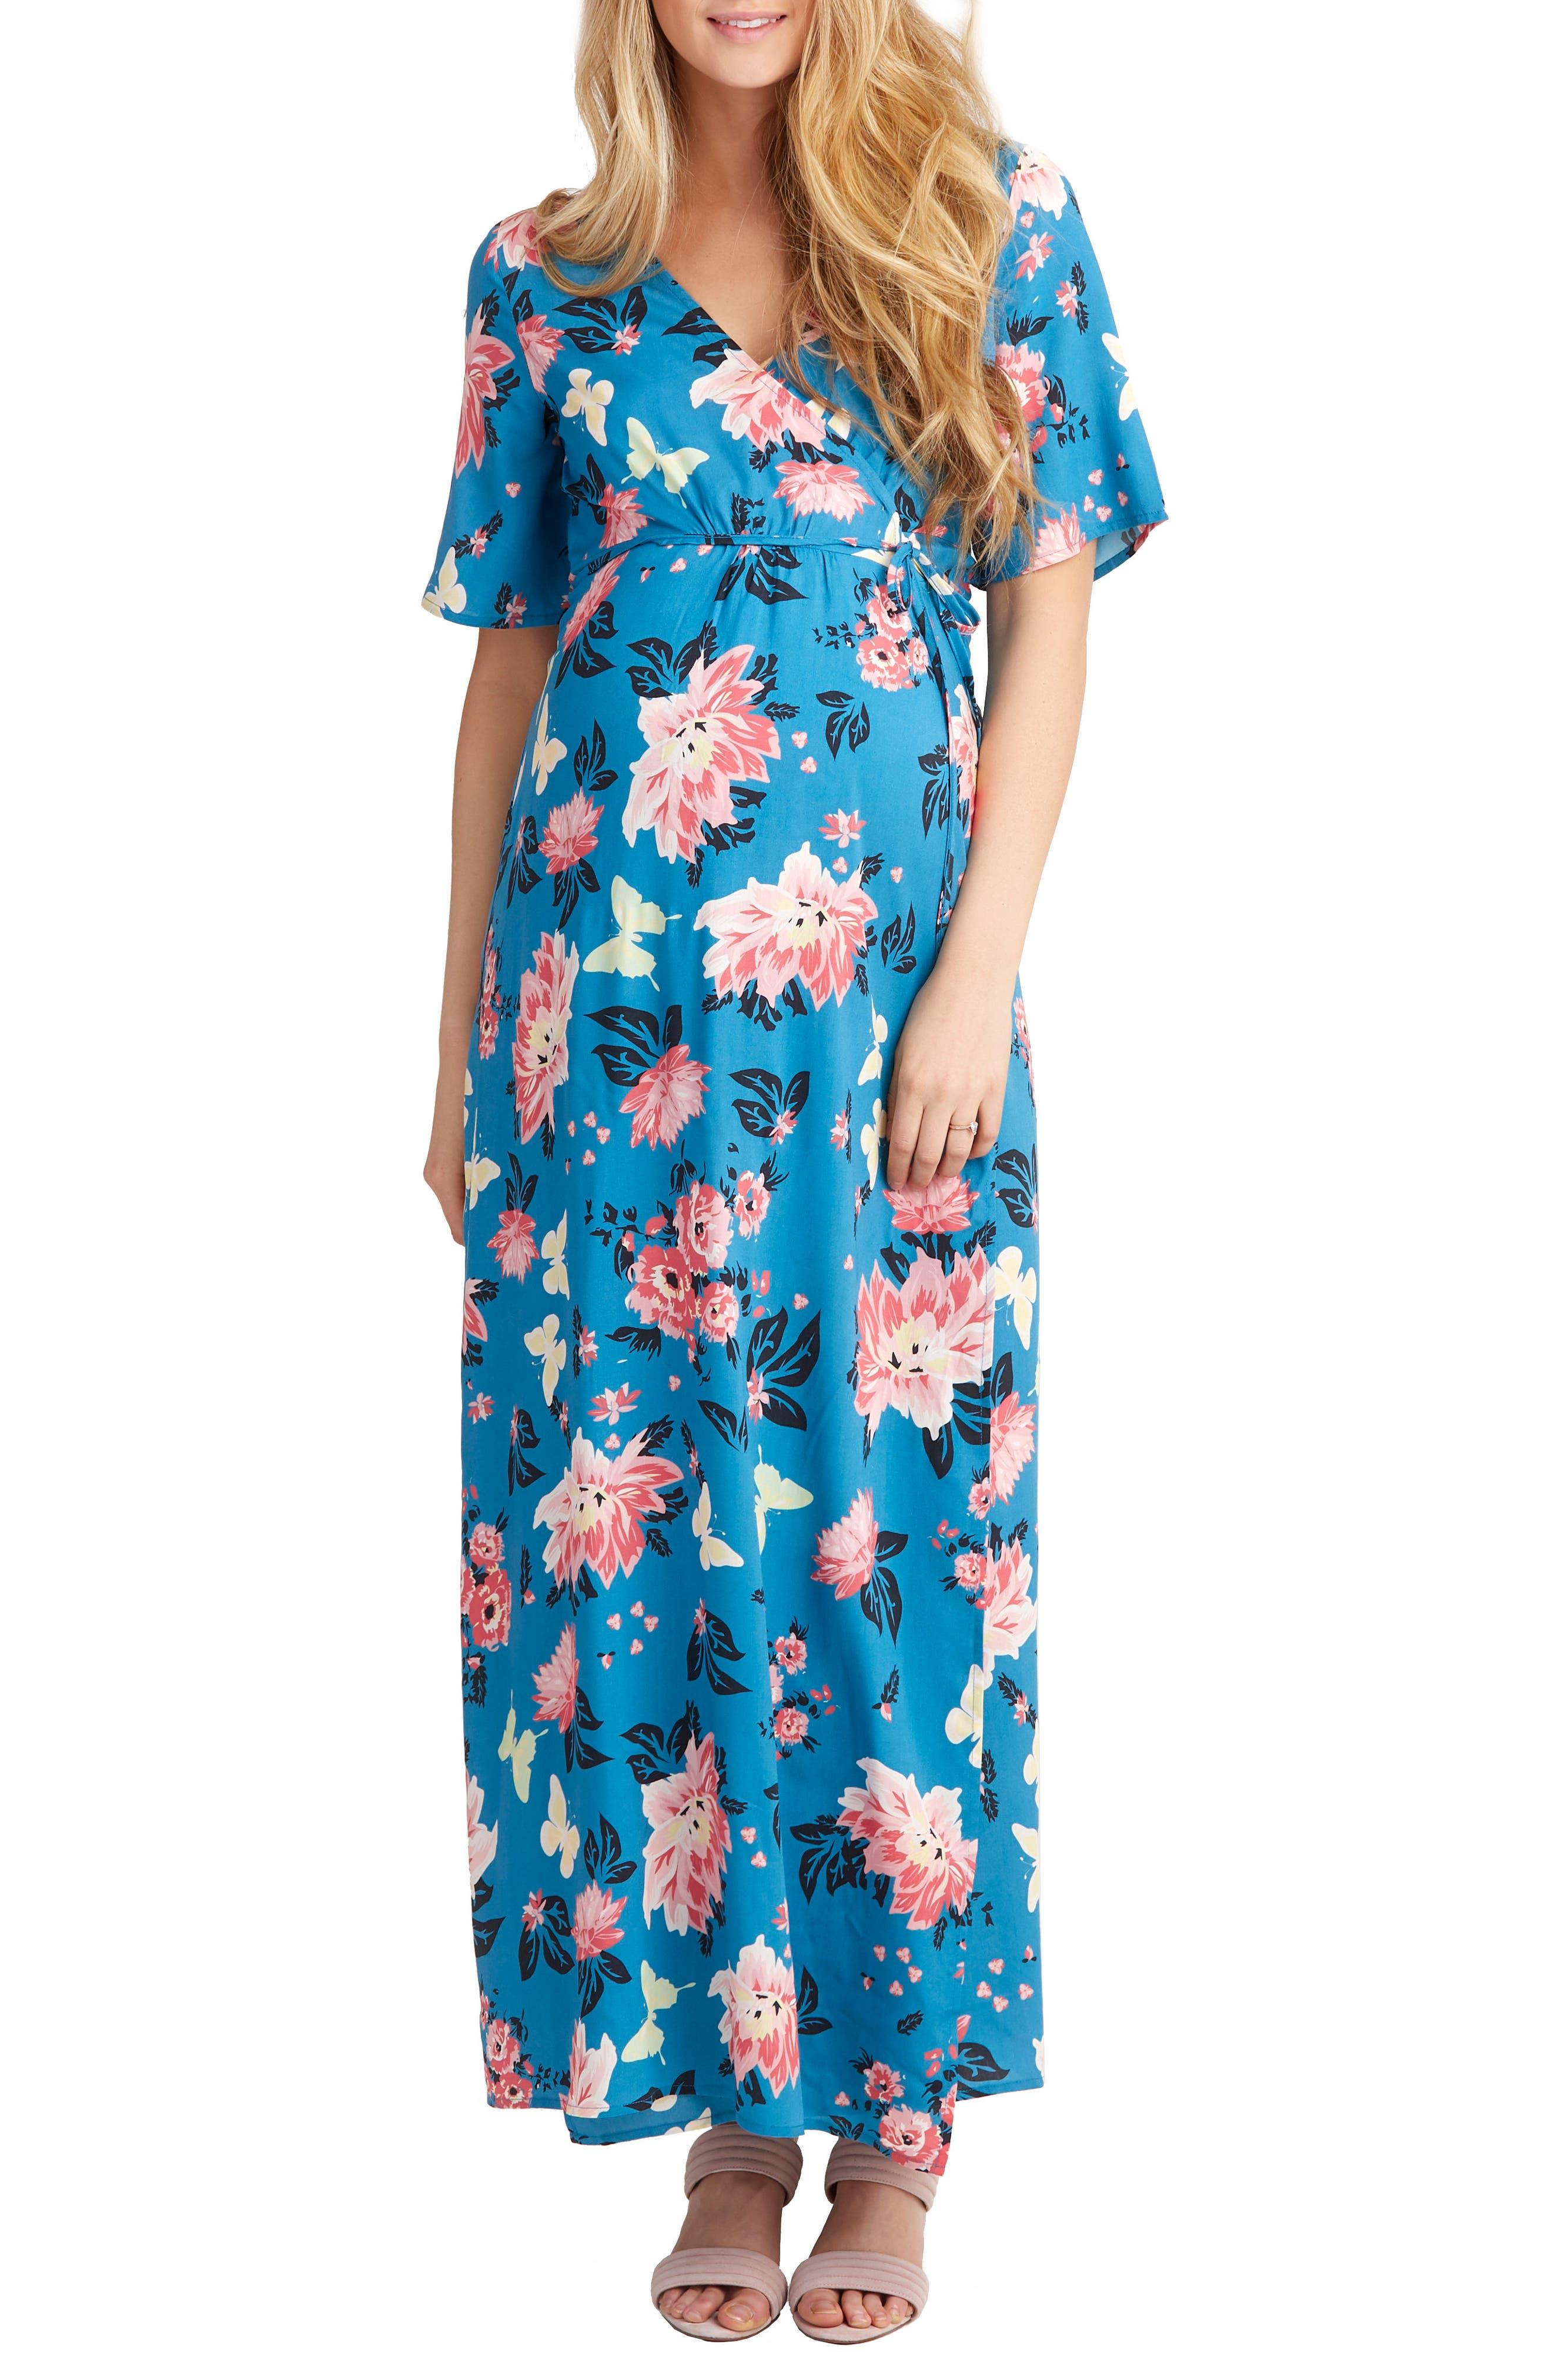 NOM MATERNITY,                             Landon Maxi Wrap Maternity/Nursing Dress,                             Main thumbnail 1, color,                             FLORAL